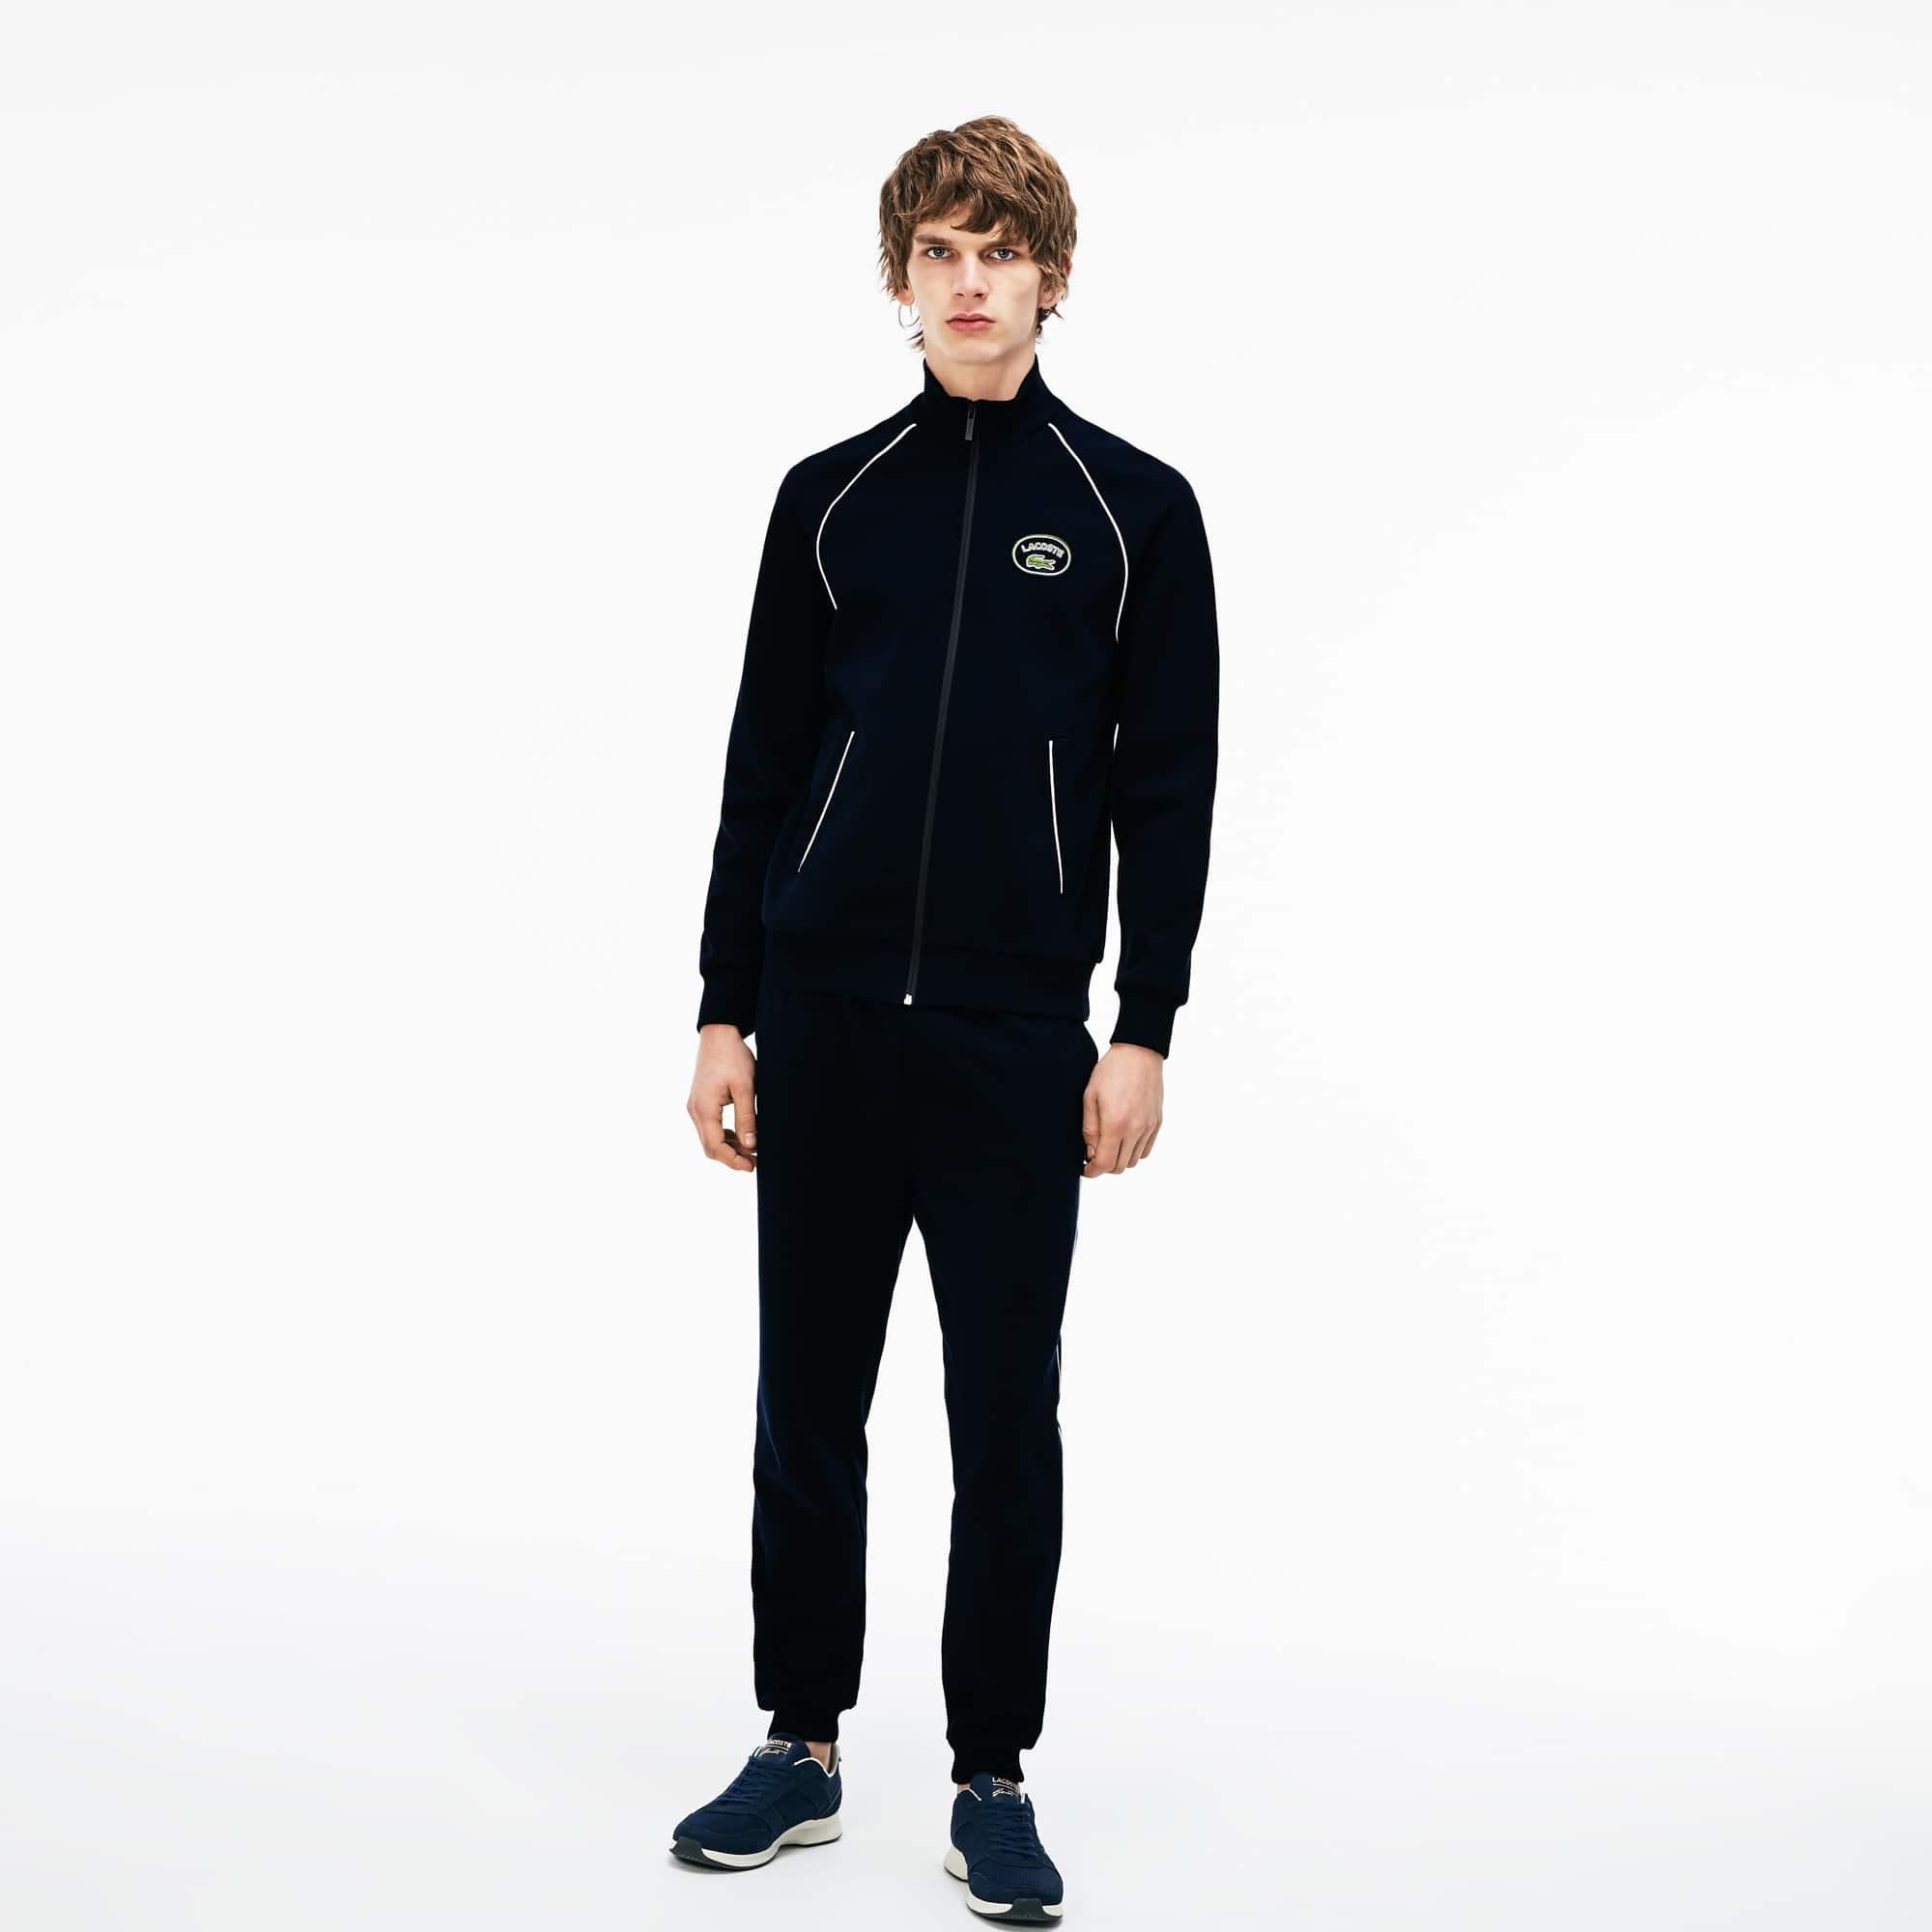 Piping Zippé Montant Milano Col Sweatshirt En Coton Avec tsQrdhC